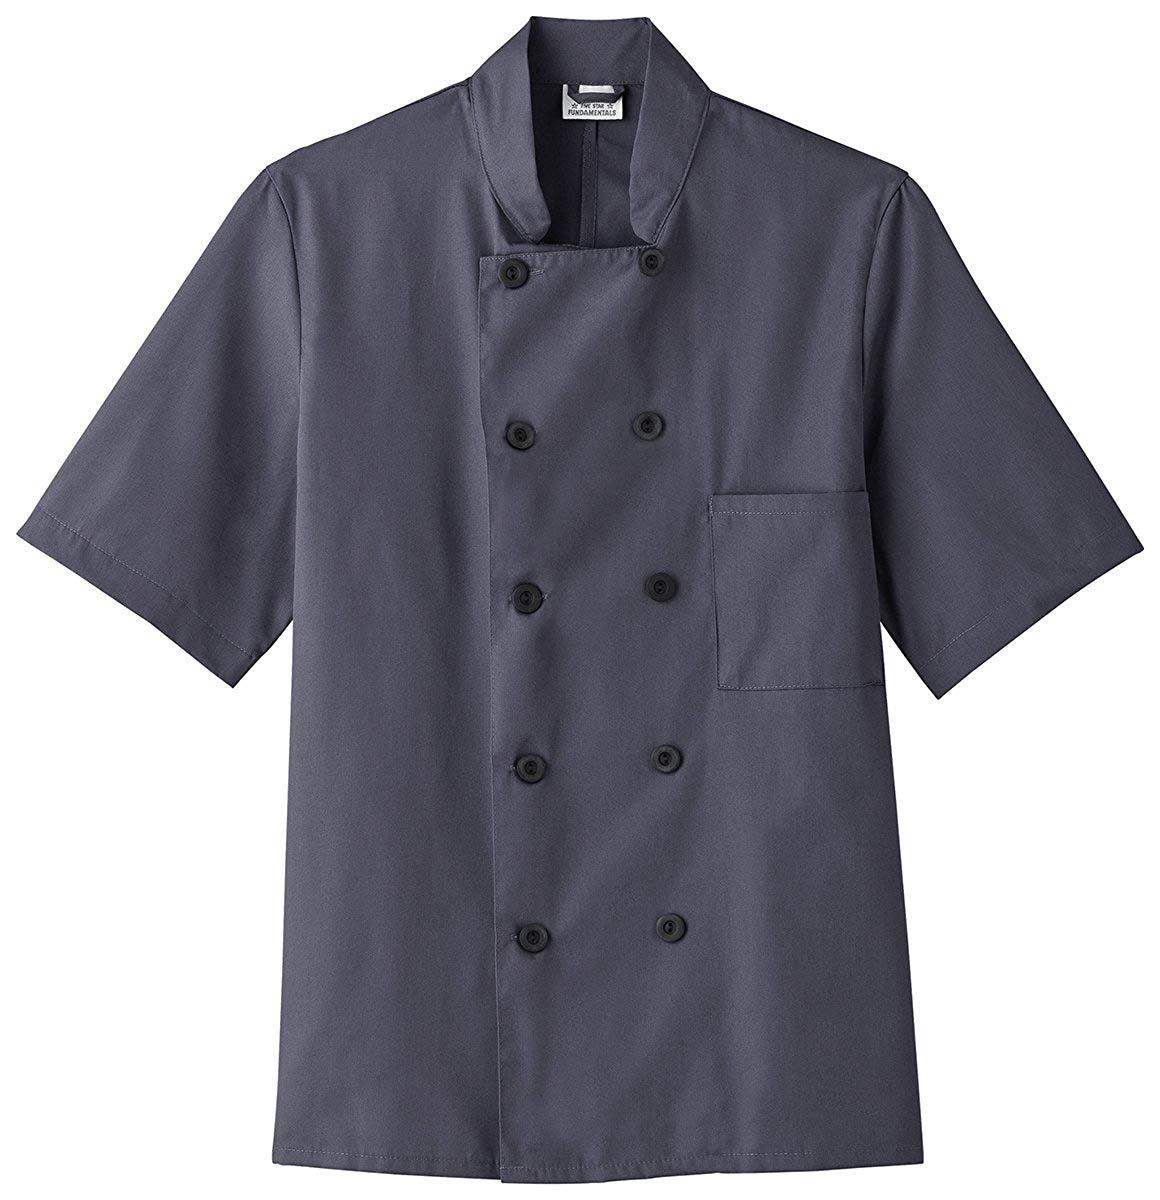 Five Star Chef Apparel Unisex Short Sleeve Chef Jacket